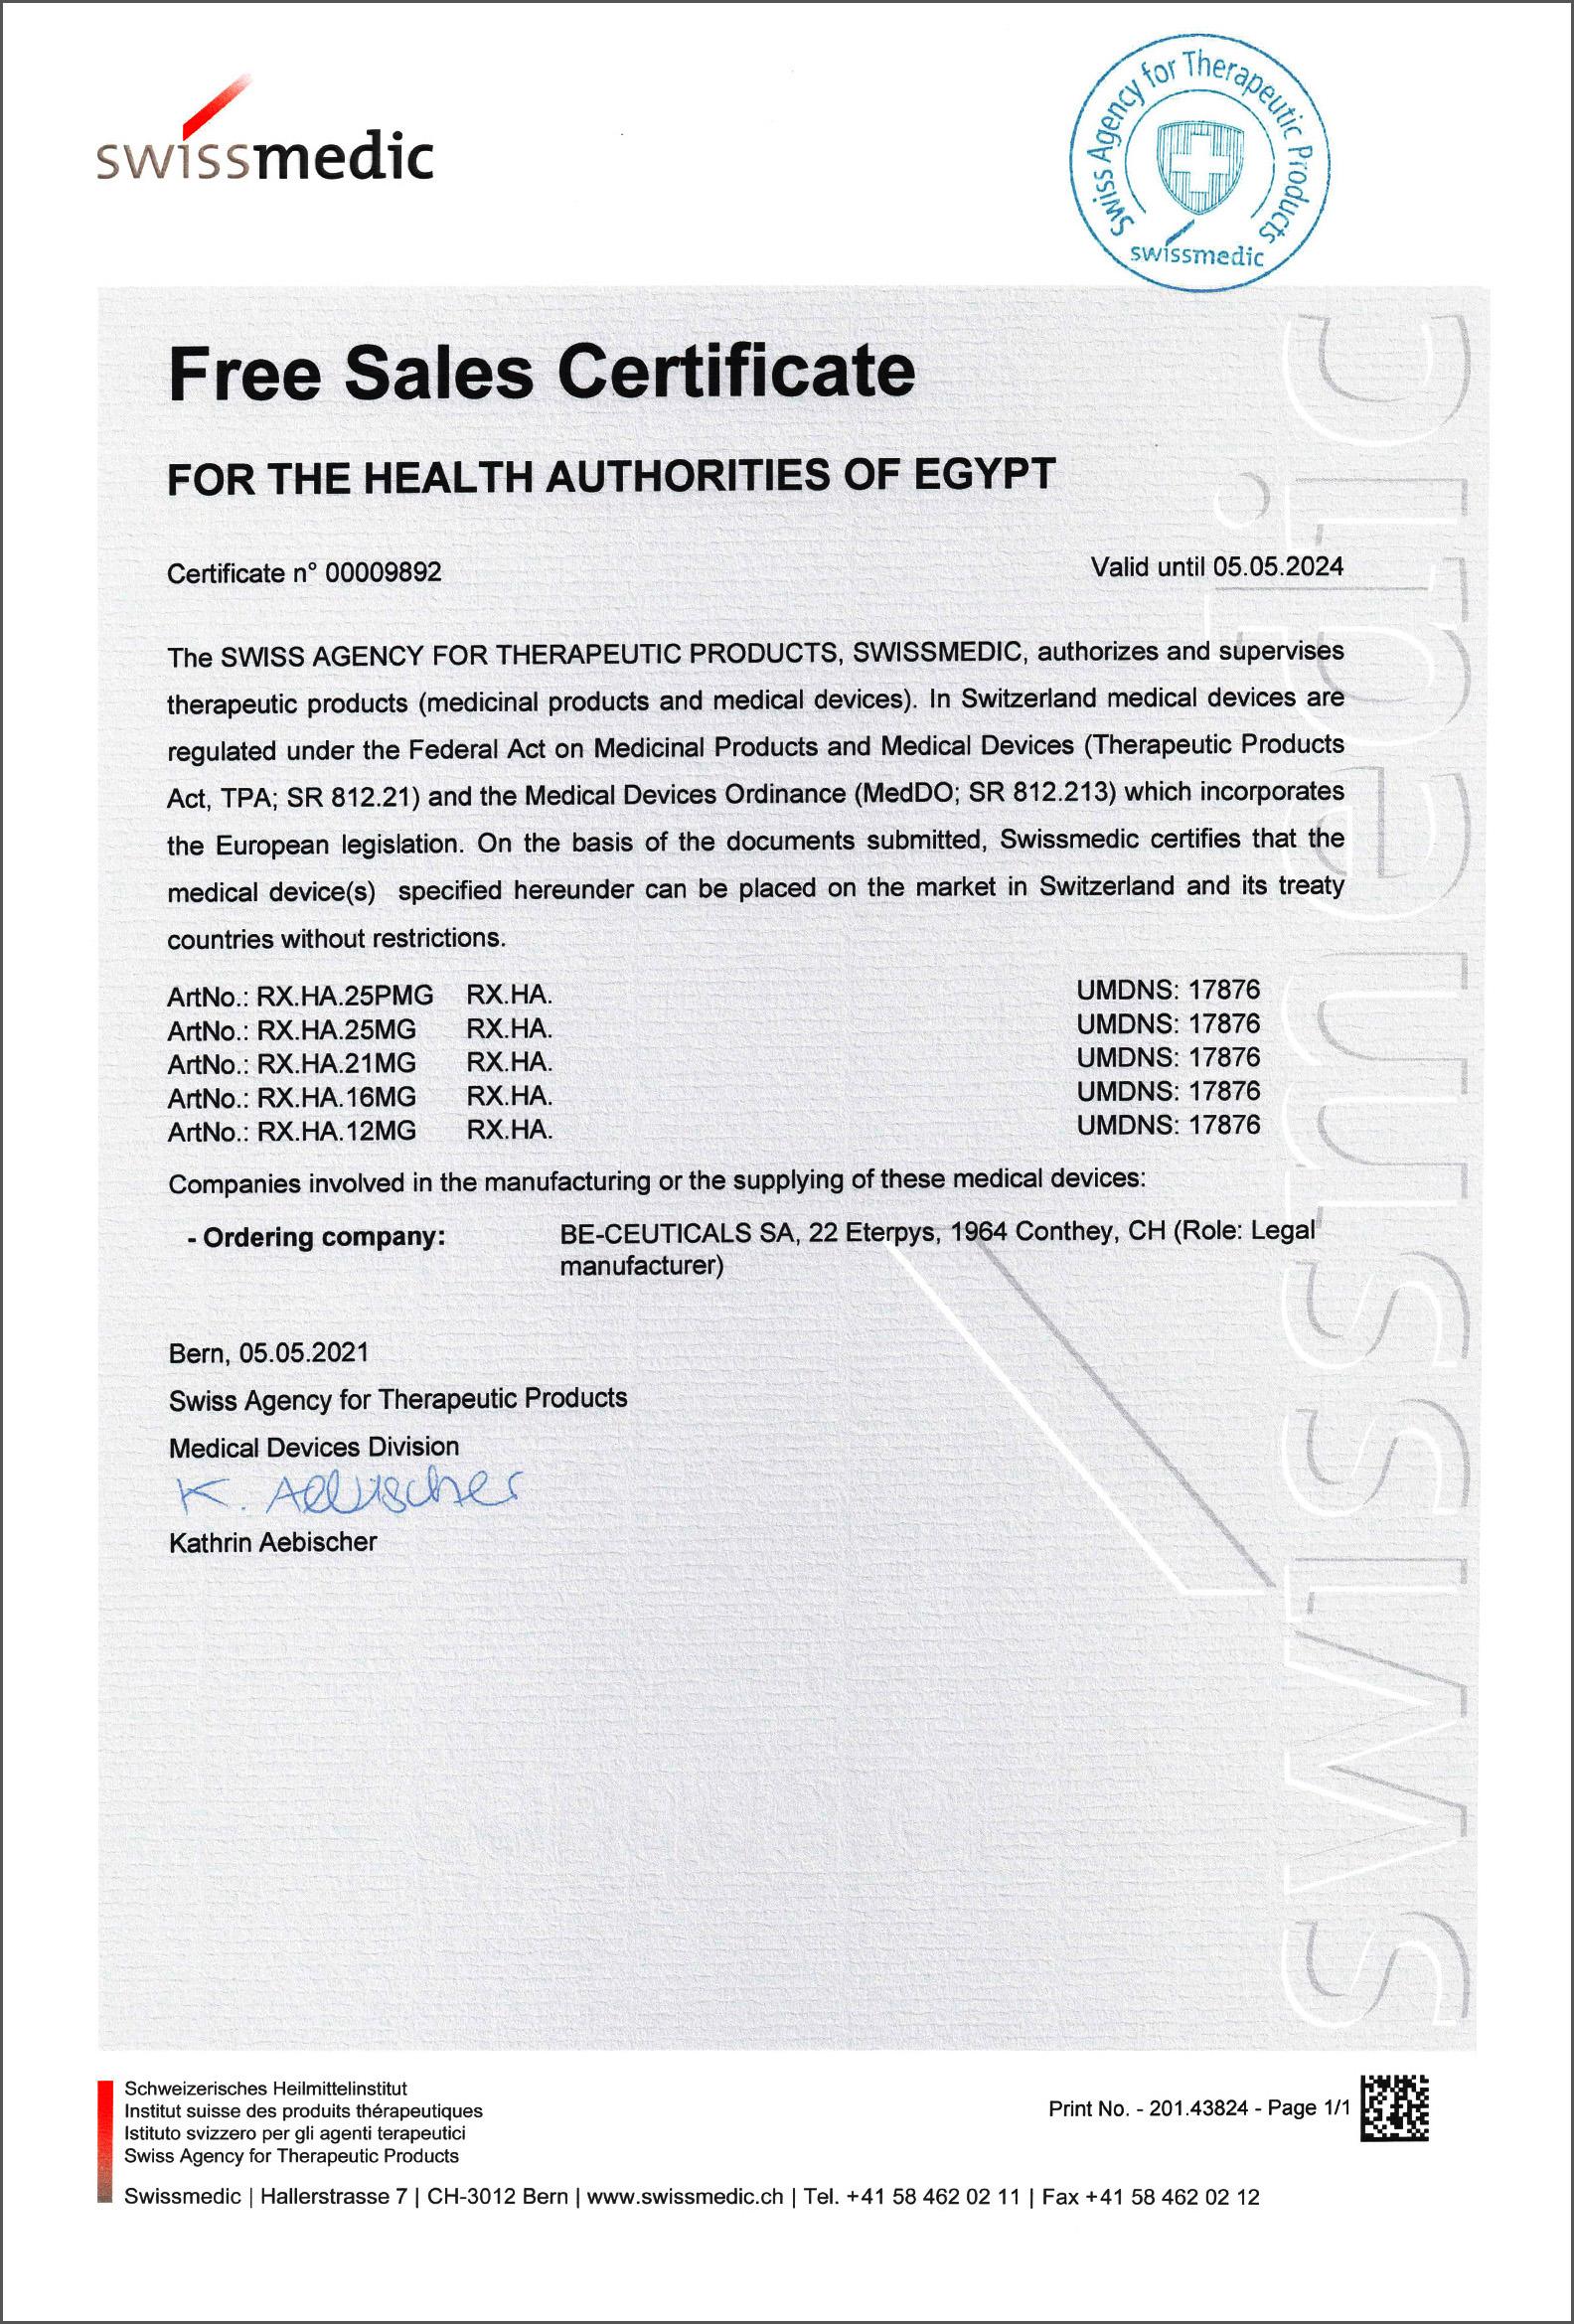 Swissmedic - Free Sales Certificate - Egypt